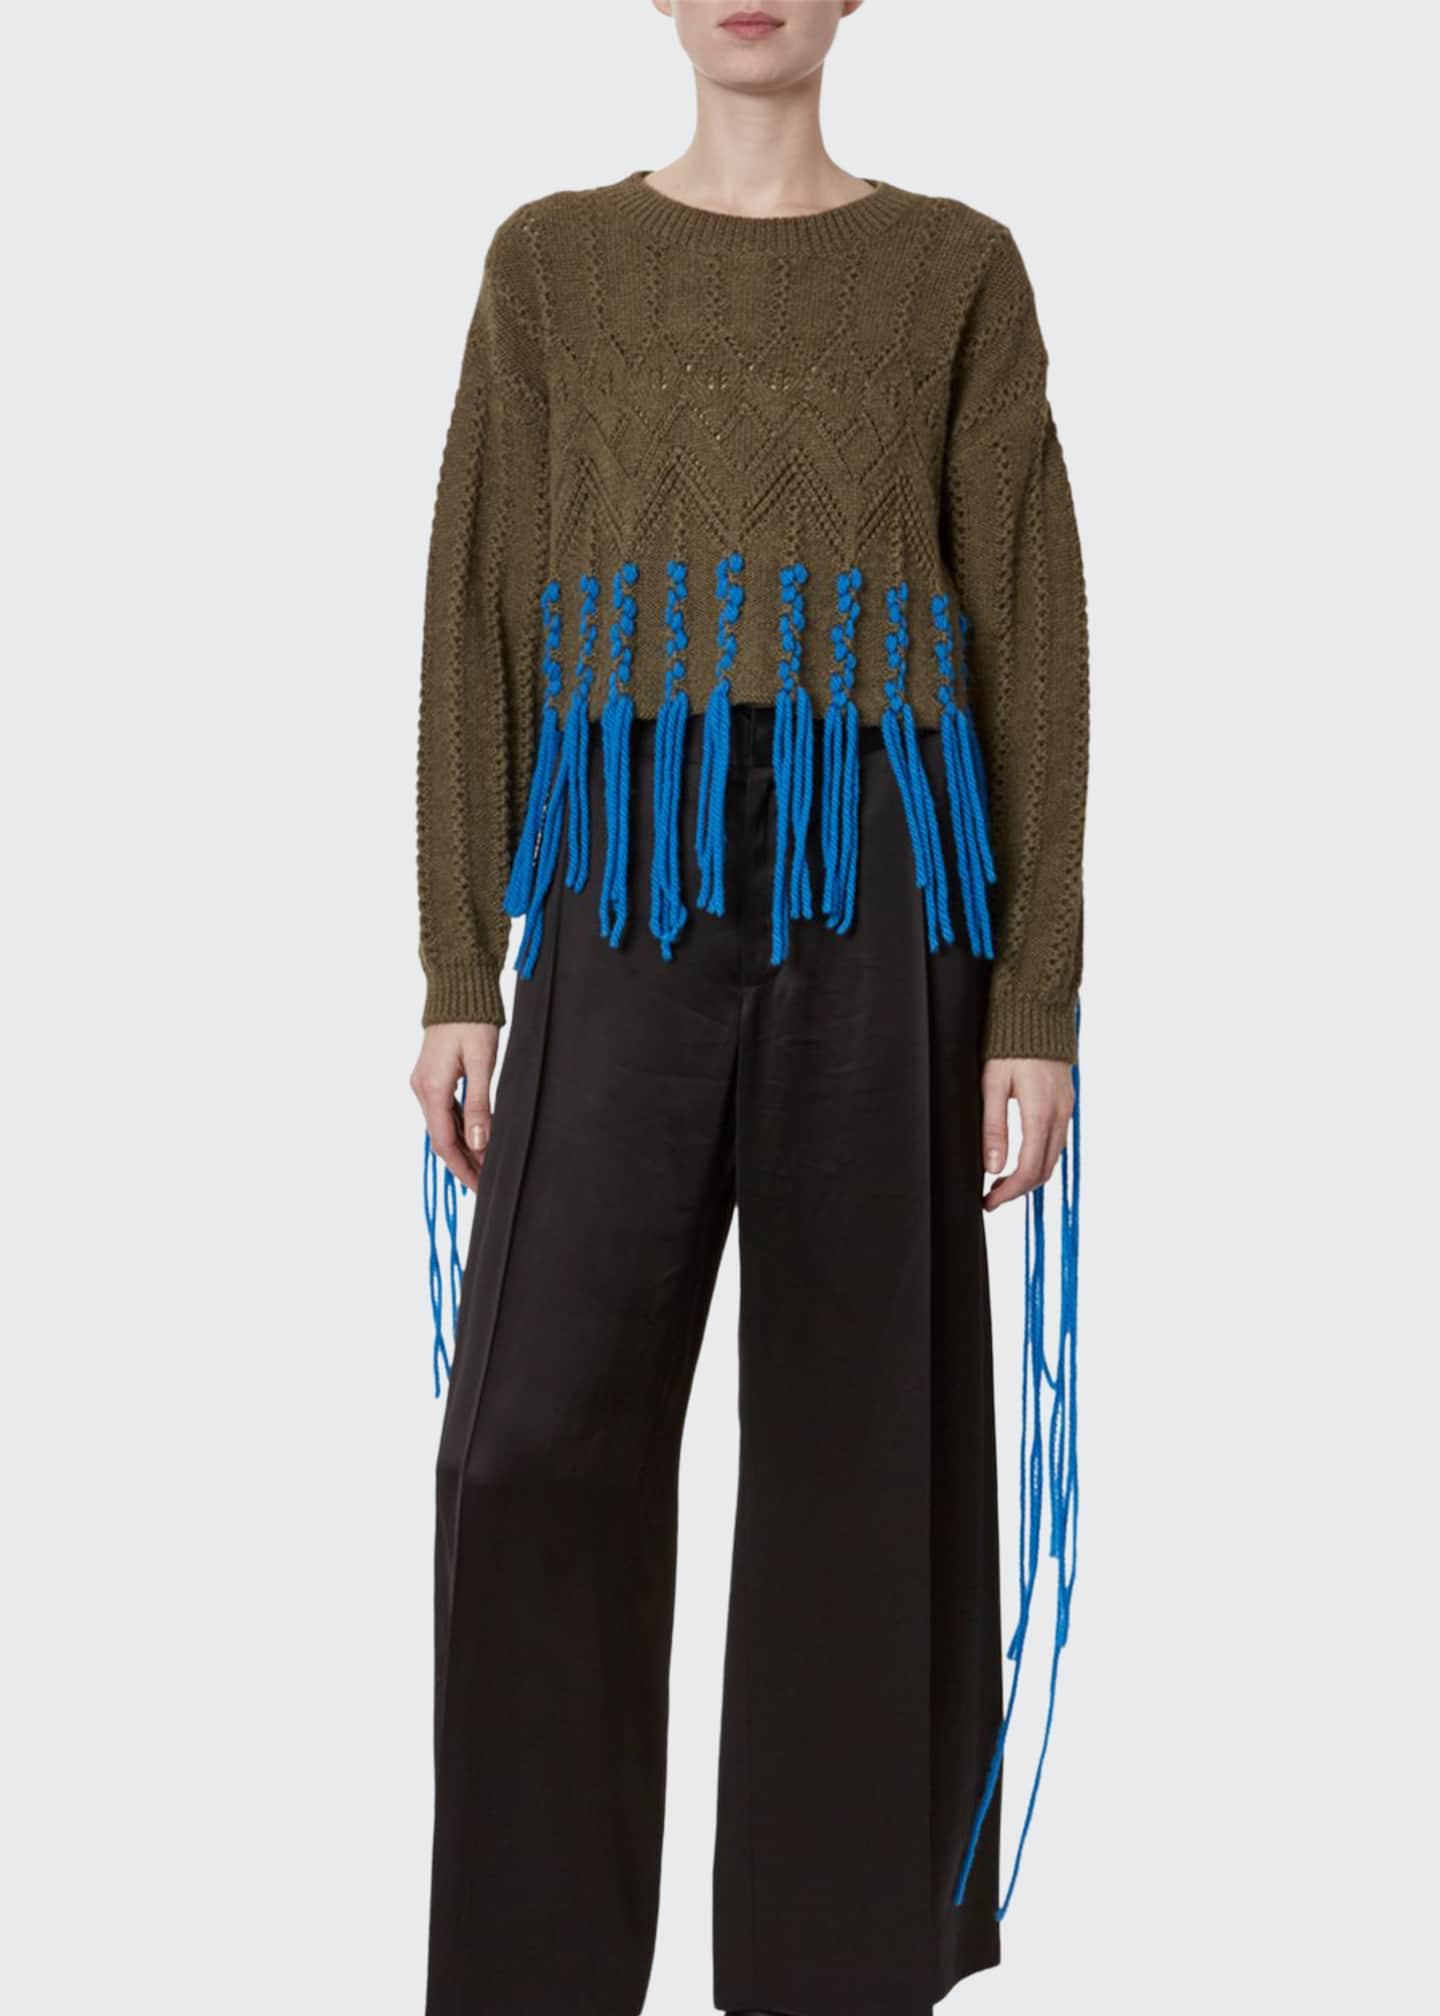 Loewe Two-Tone Fringed Crop Sweater